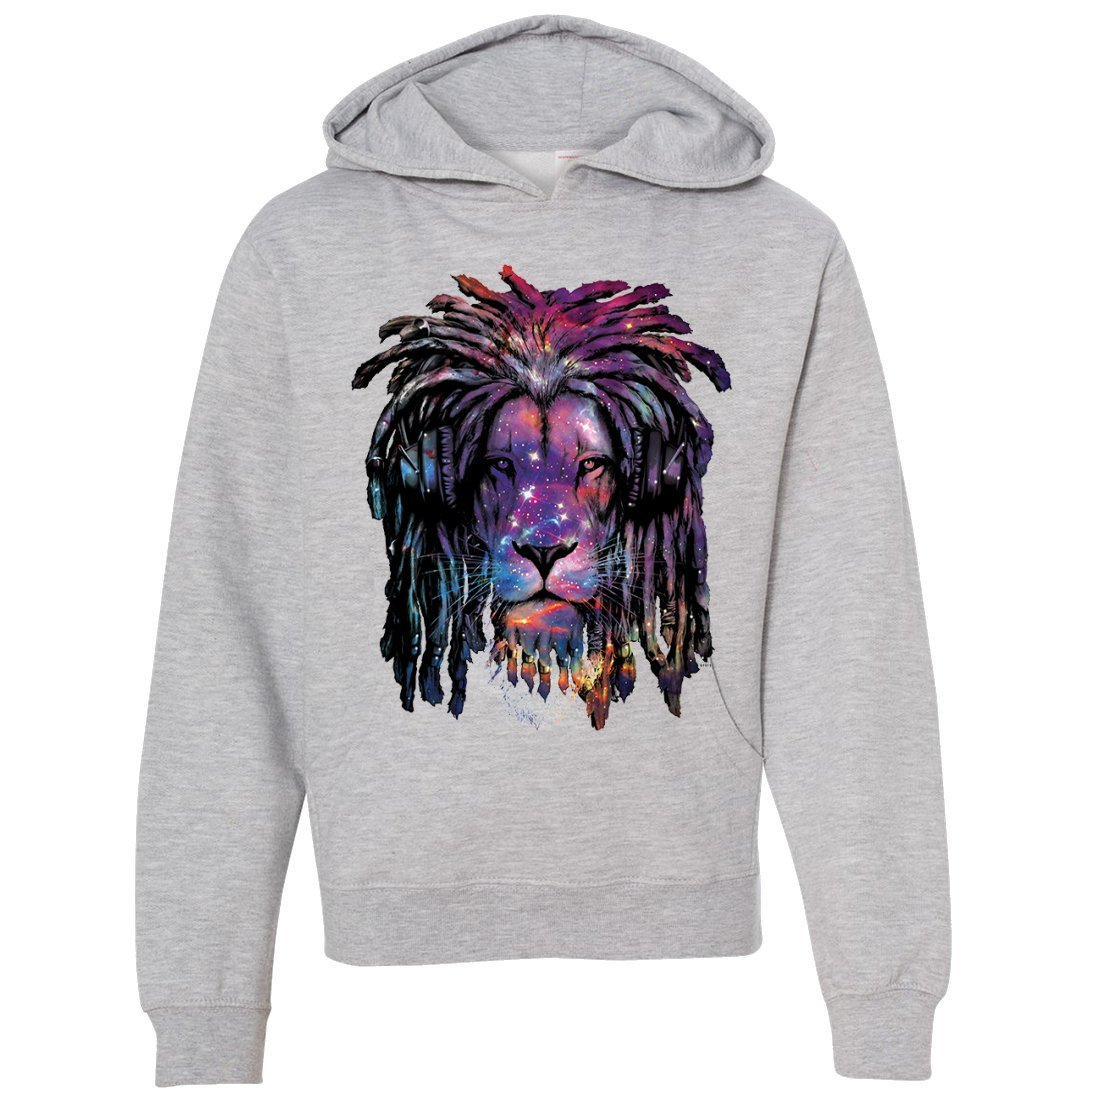 Dolphin Shirt Co Space Galaxy Lion Face Dreadlocks Youth Sweatshirt Hoodie